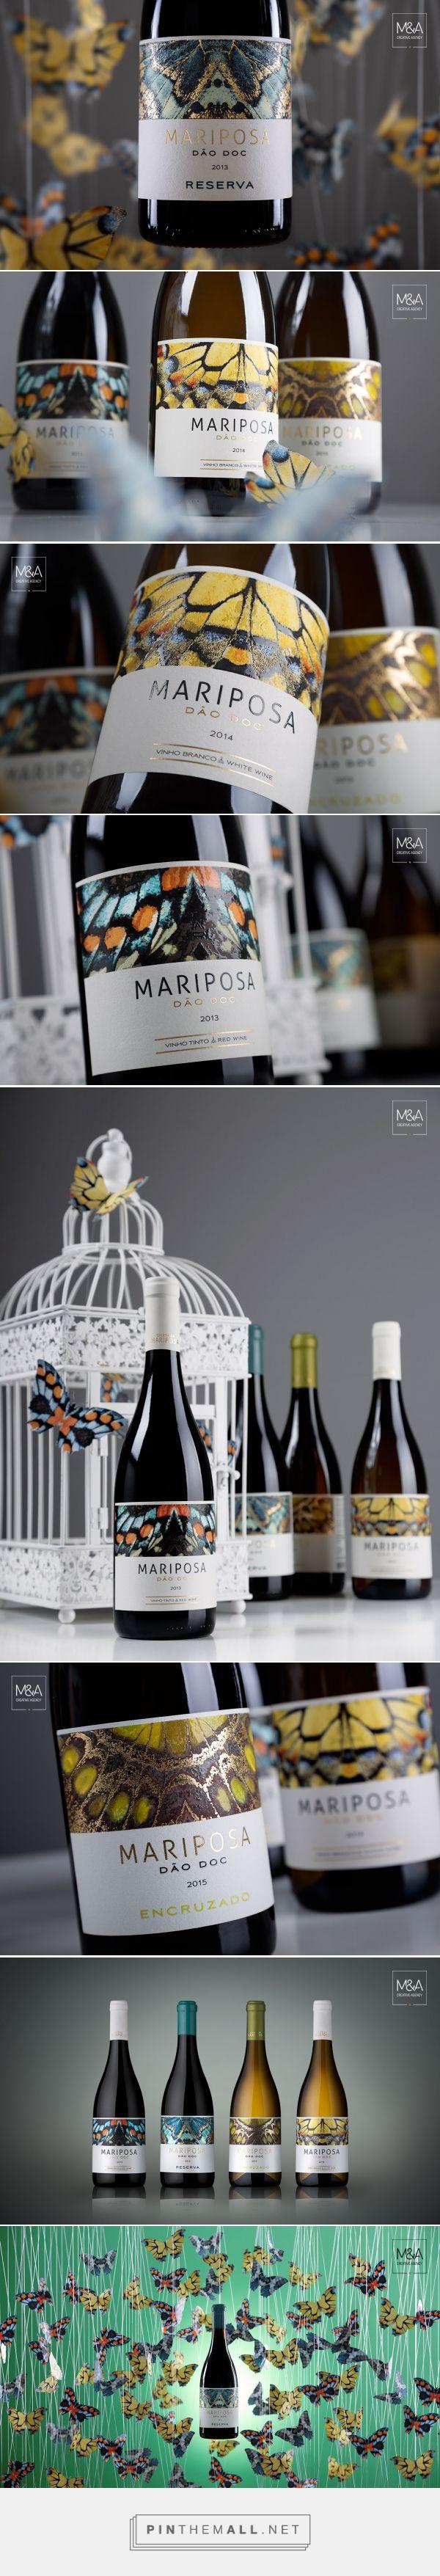 Quinta da Mariposa wine label design by M&A Creative Agency - http://www.packagingoftheworld.com/2017/02/quinta-da-mariposa.html